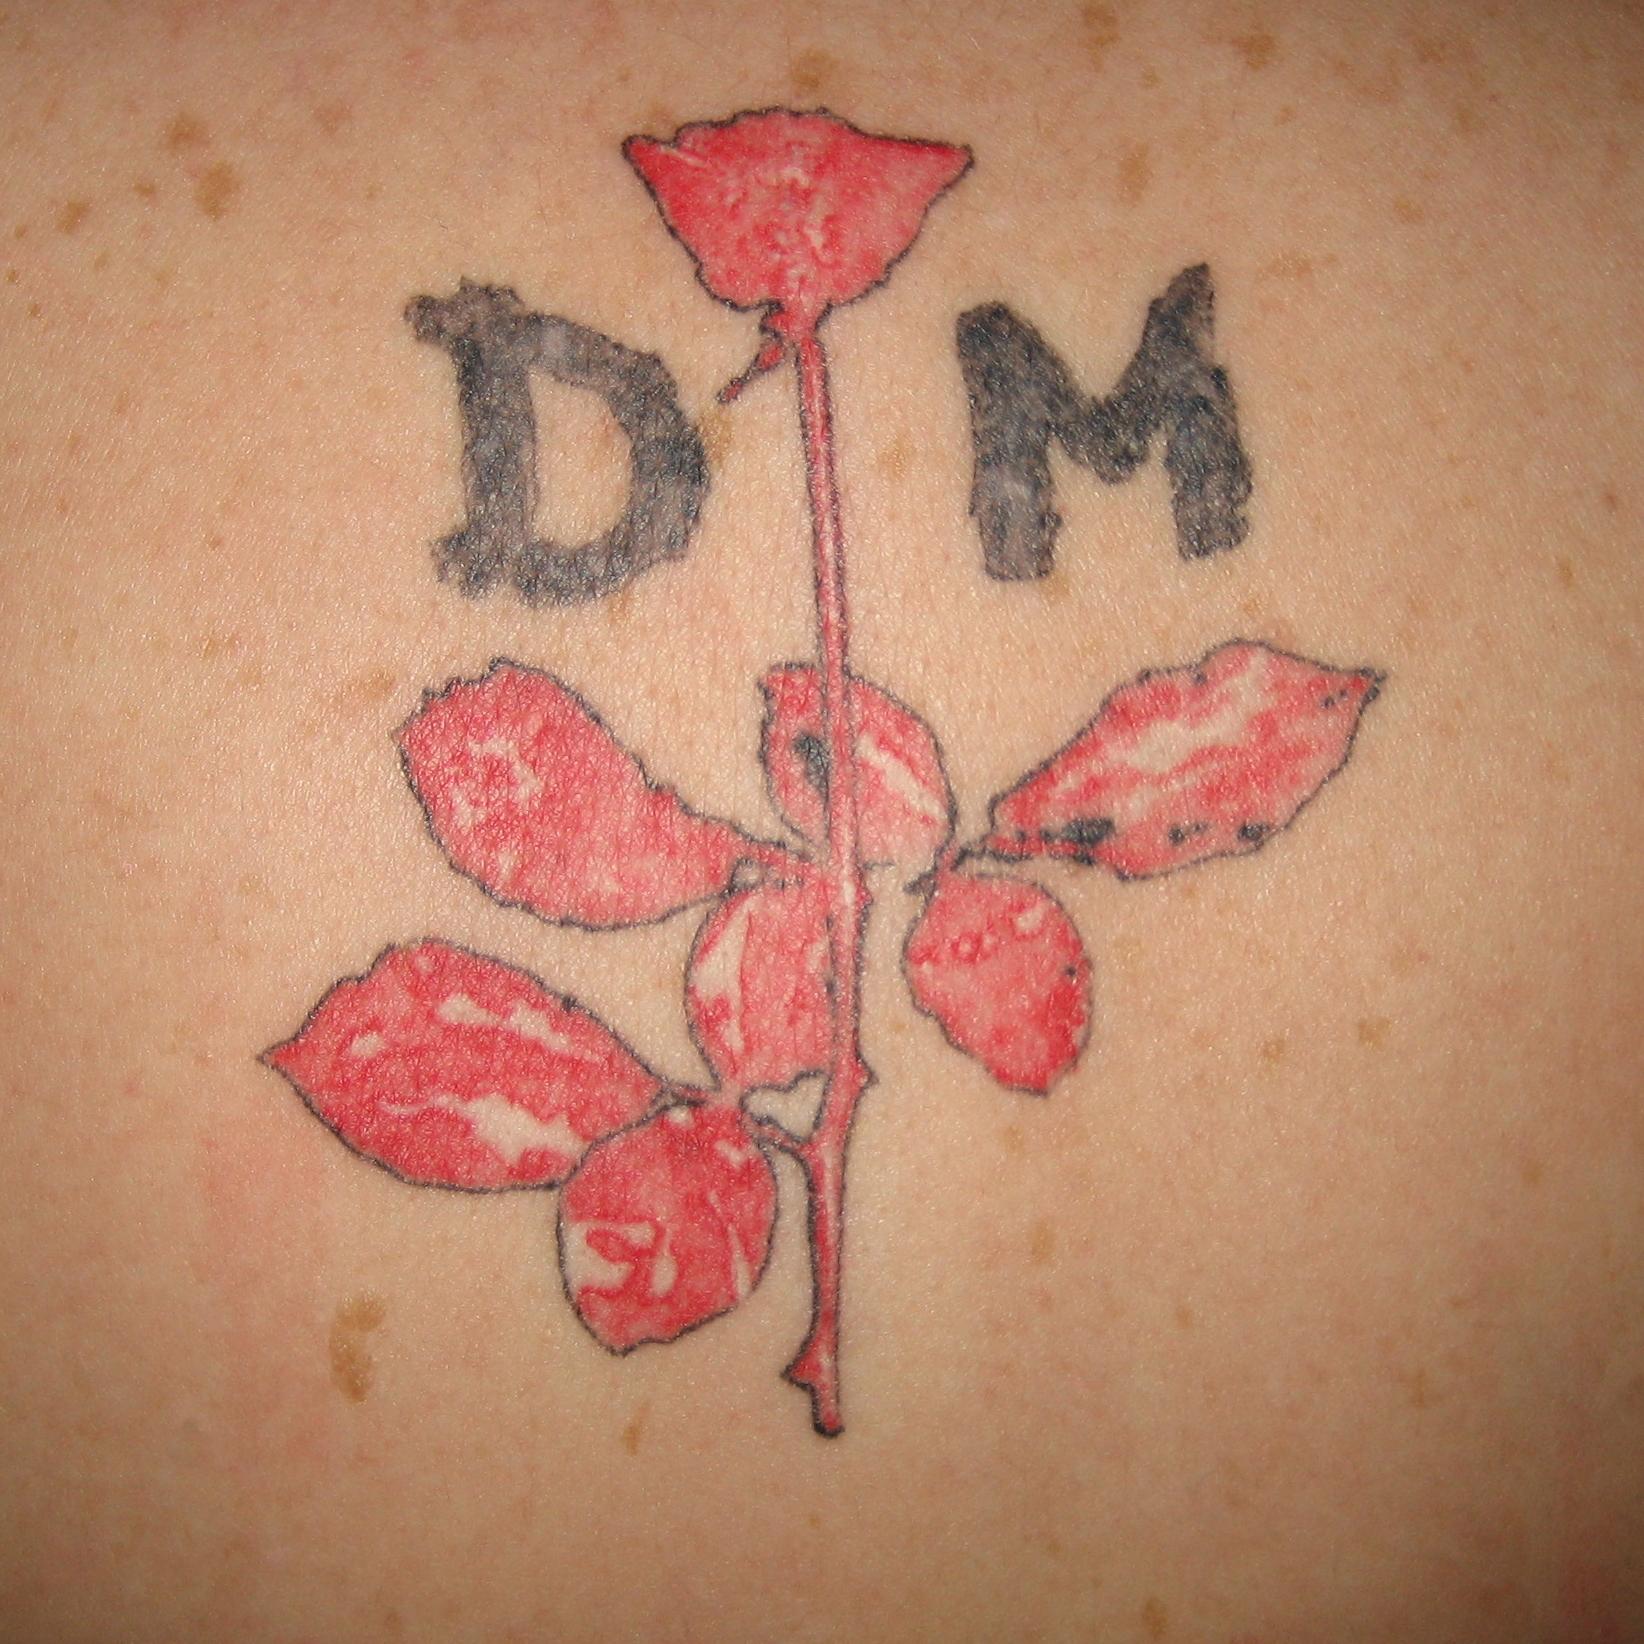 depeche mode violator tattoo - photo #12